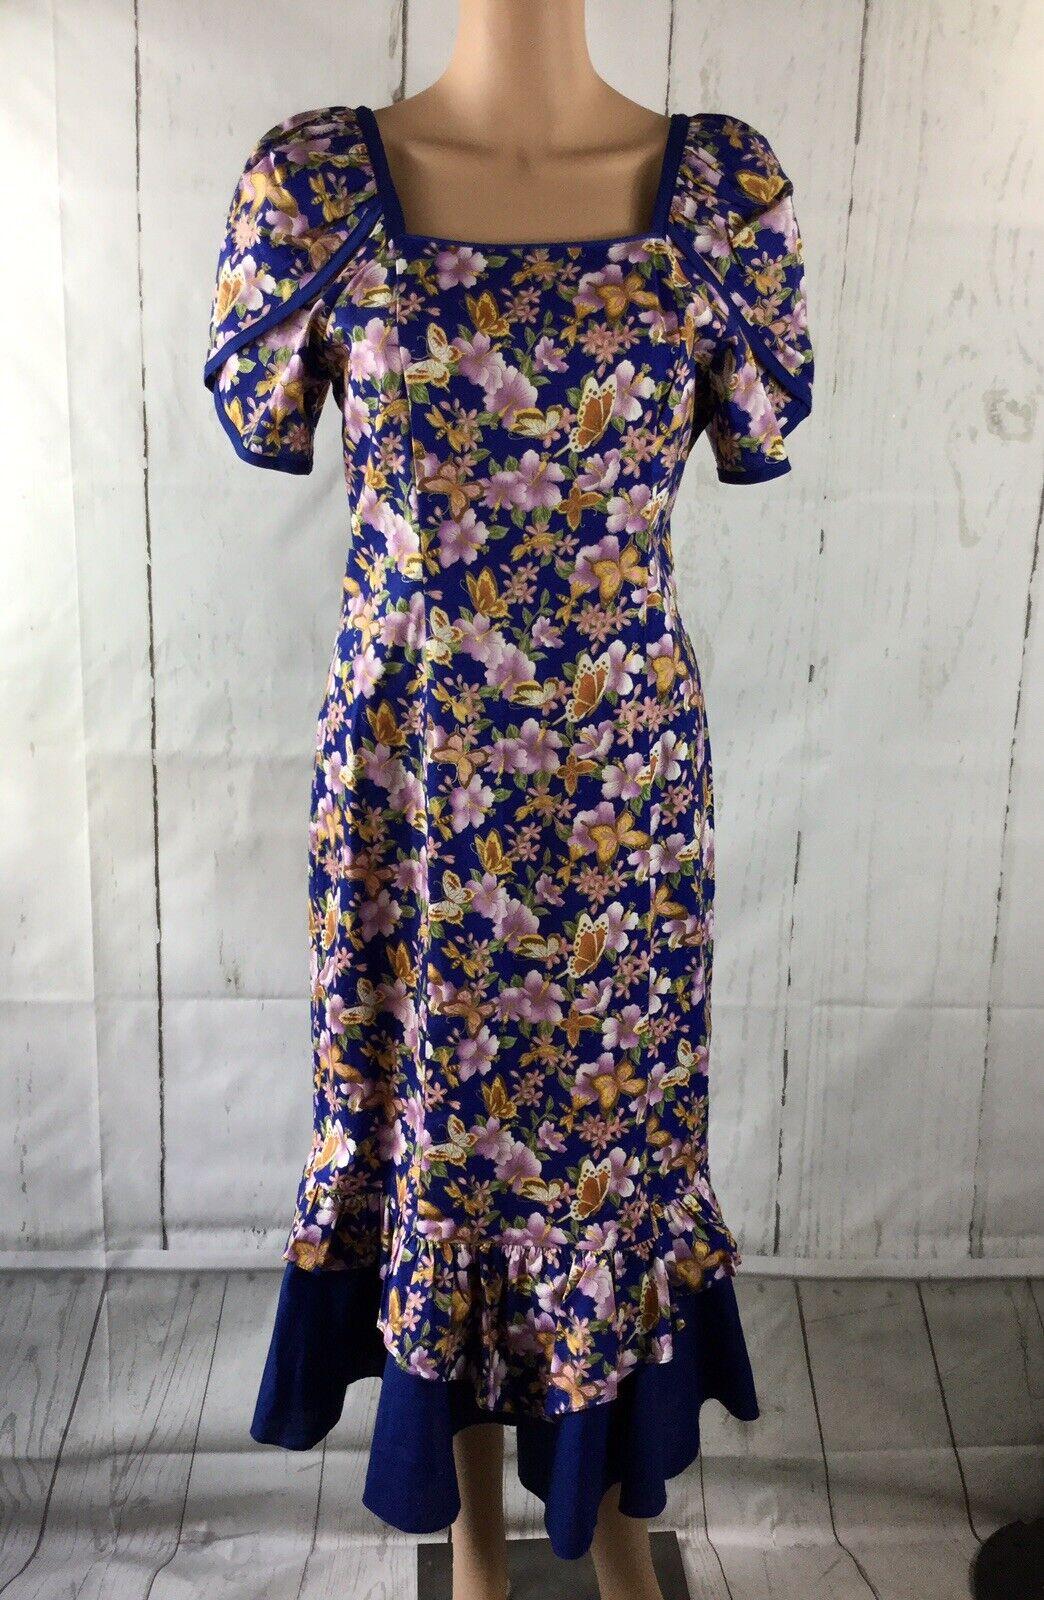 Island Aloha Wear vintage dress 100% cotton floral Blau  multi Größe Medium